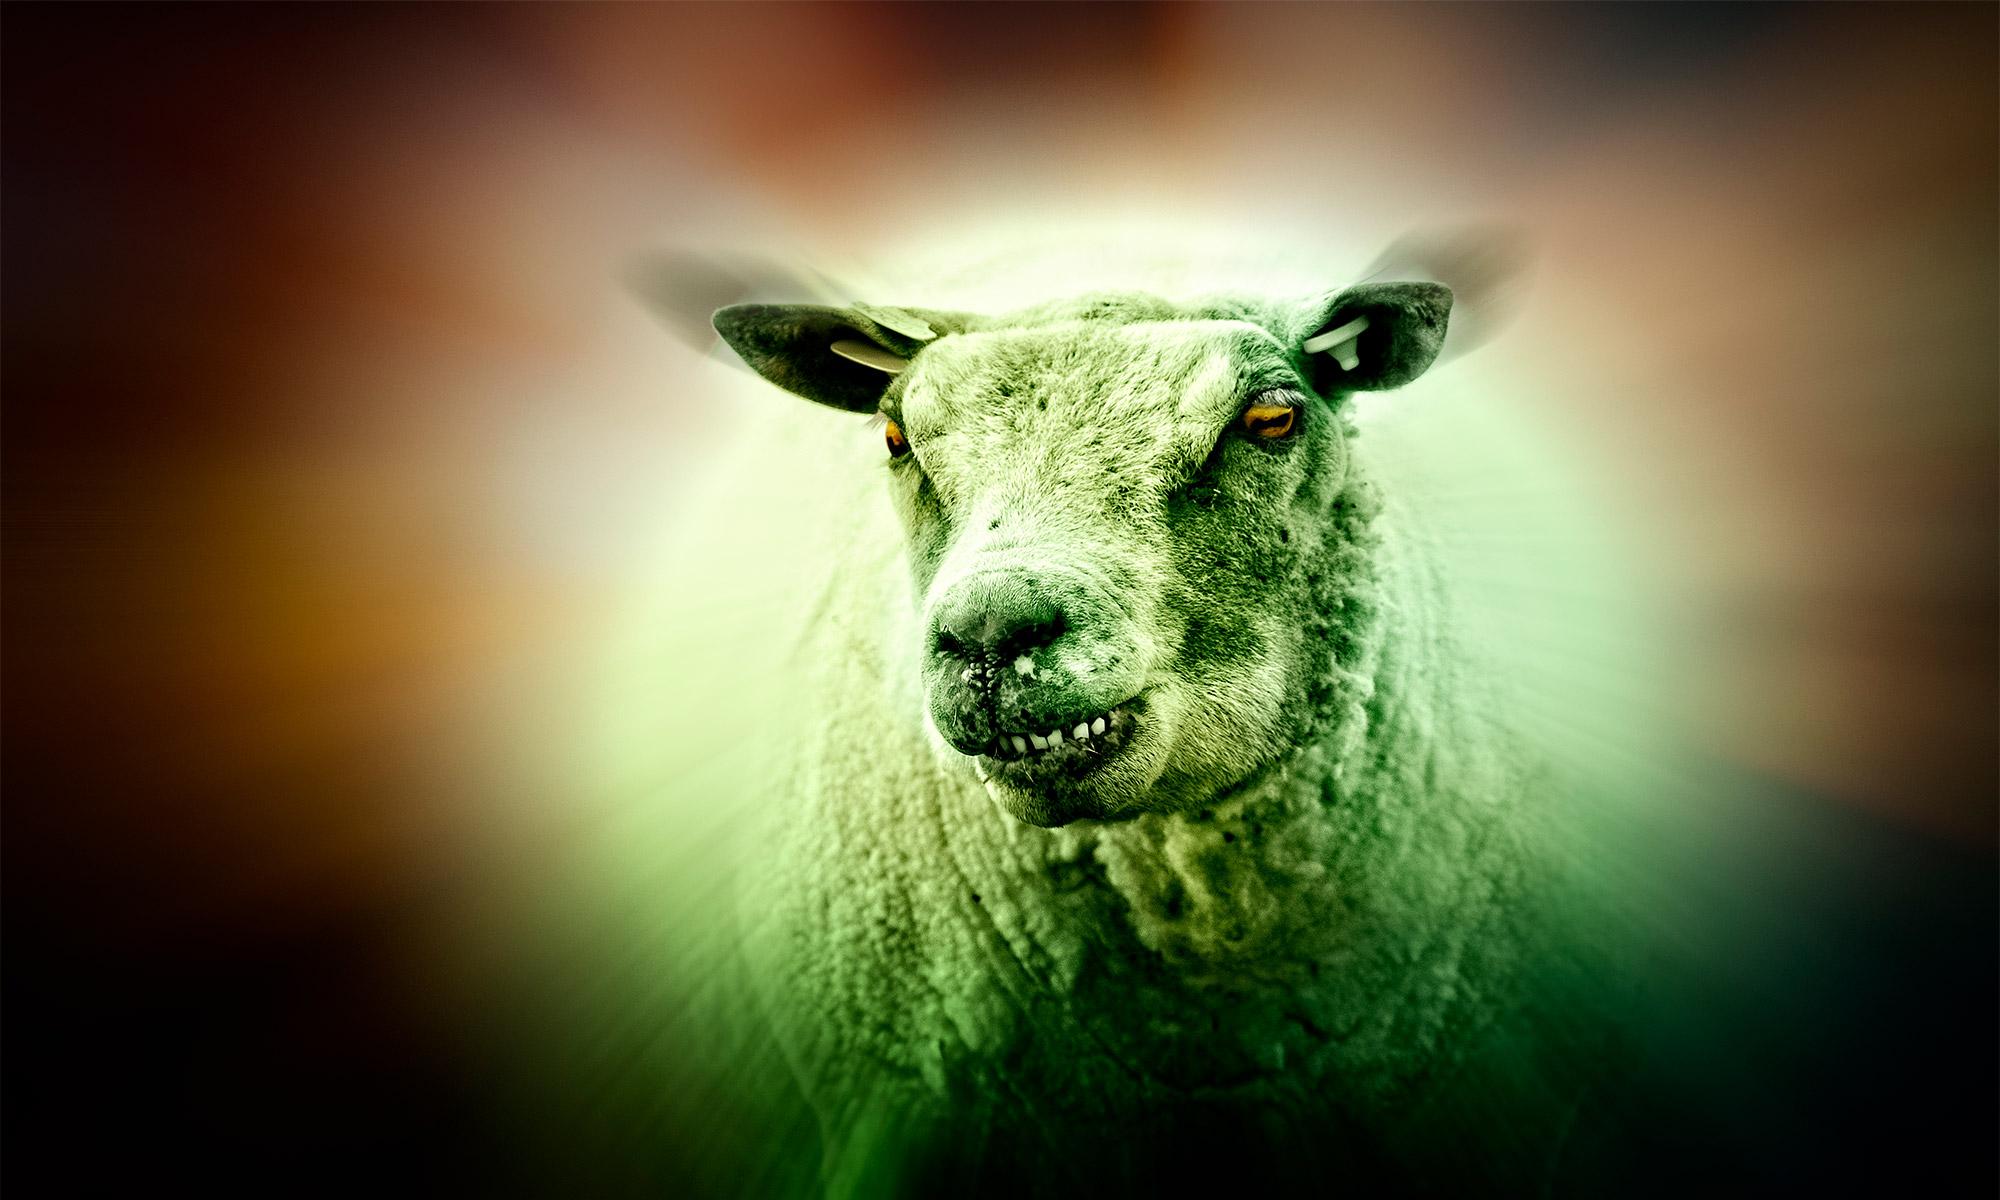 The Green Sheep